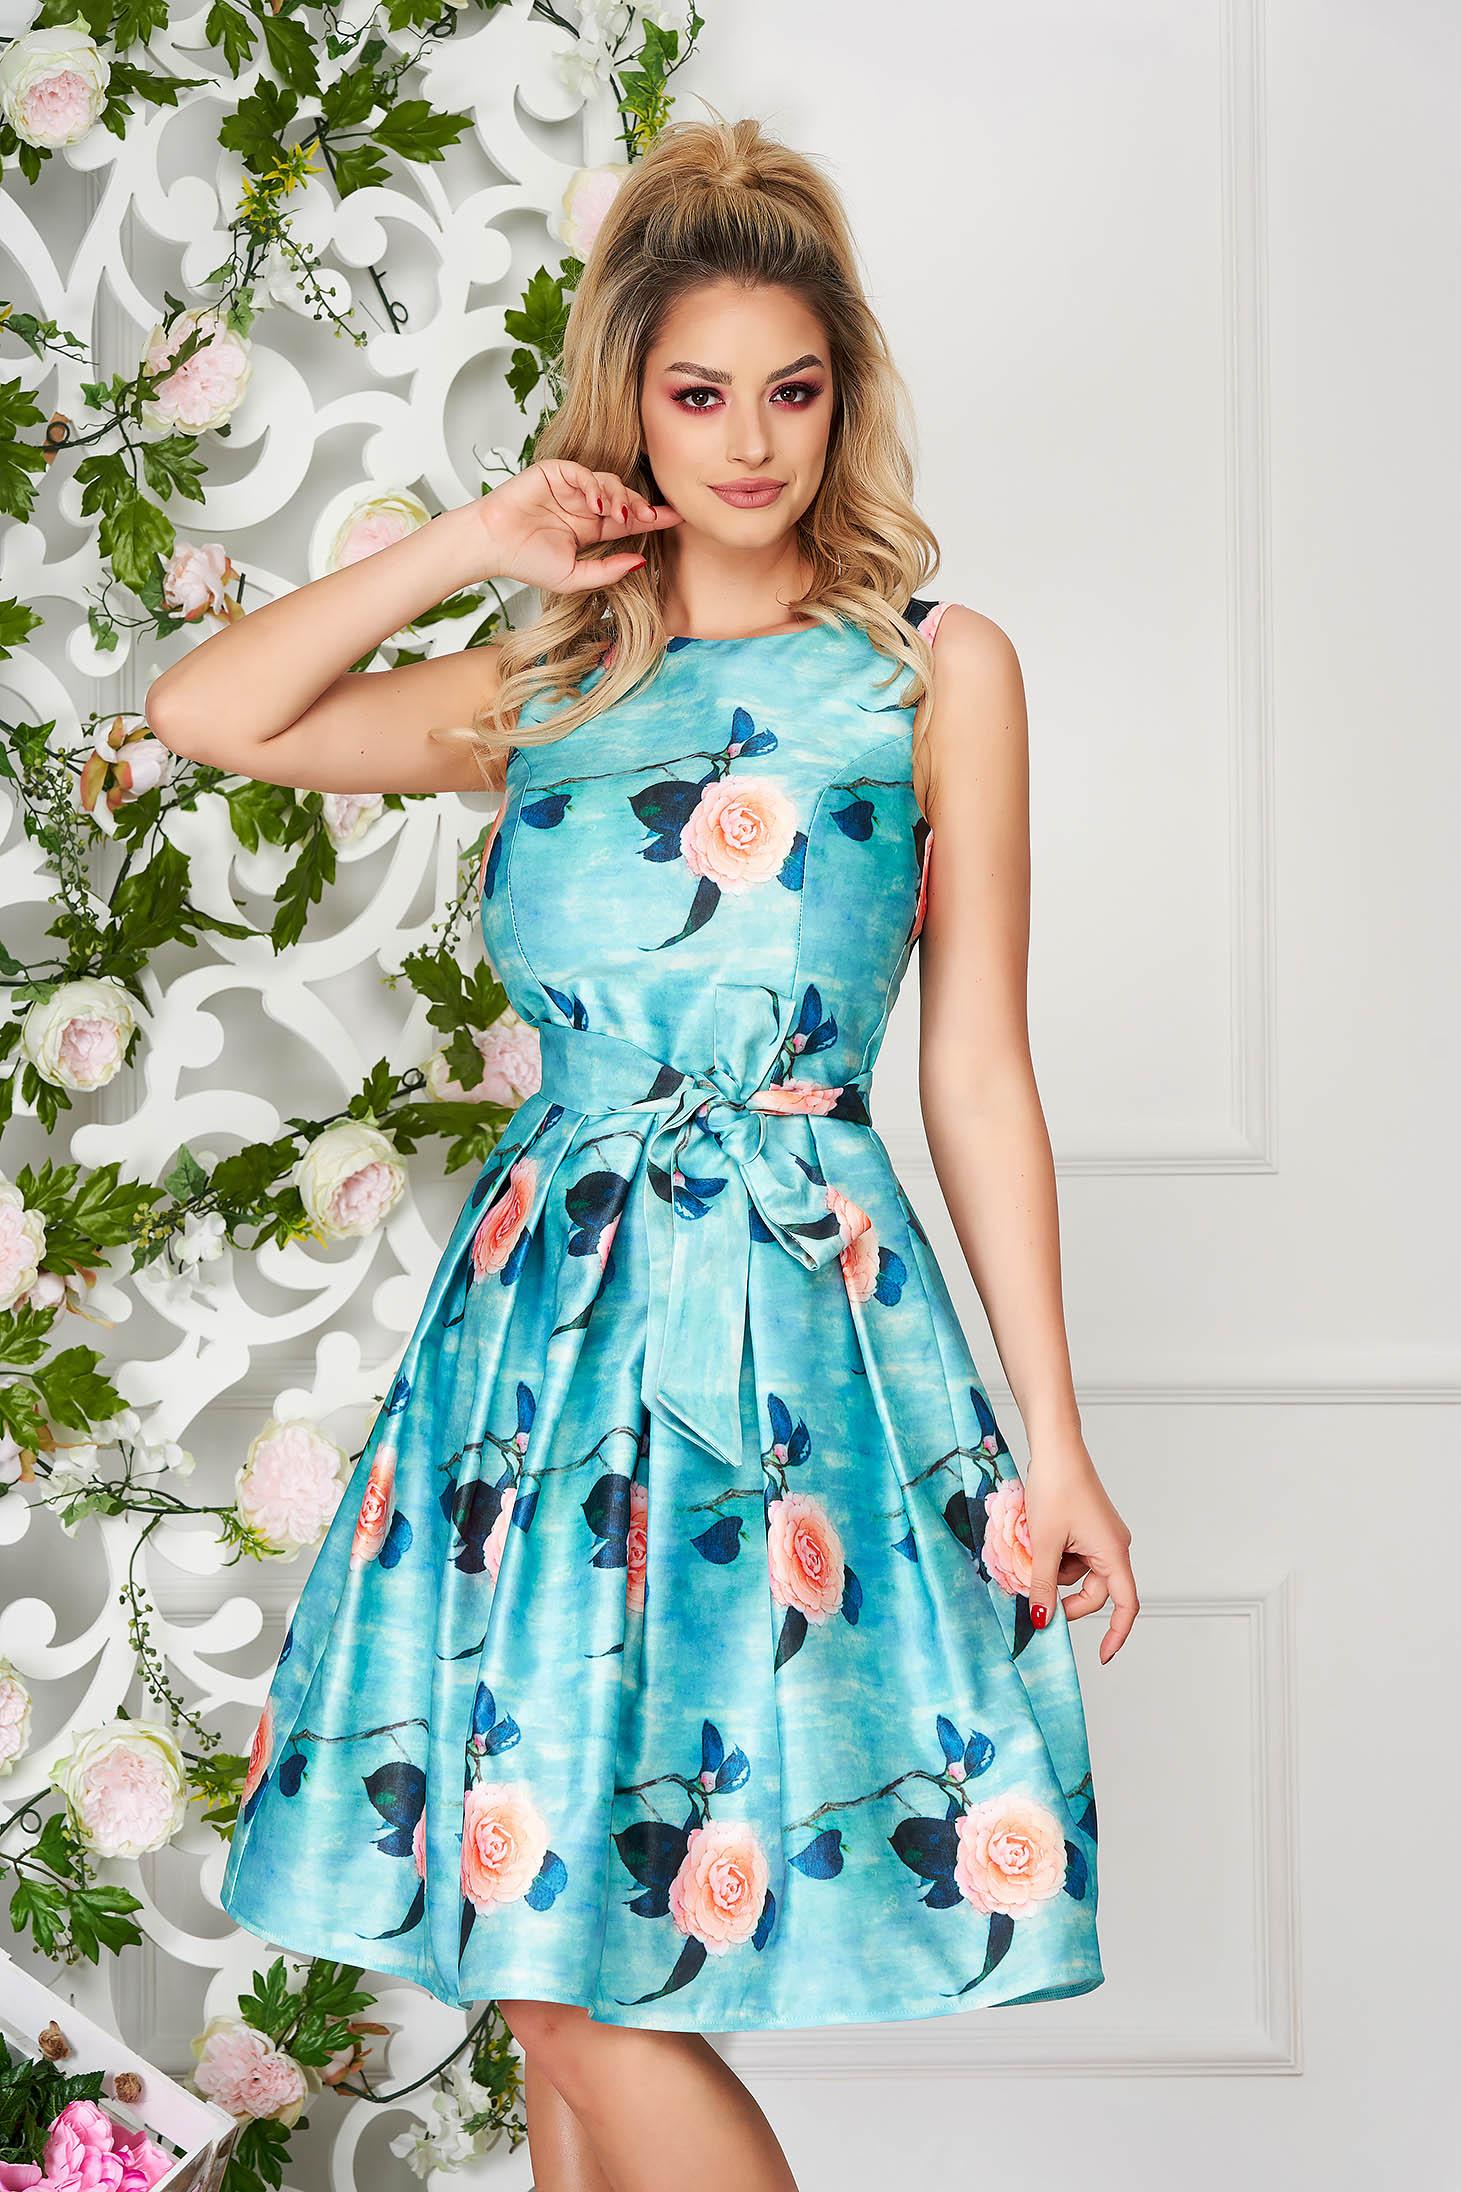 Rochie Artista albastru aqua midi de ocazie din satin fara maneci cu imprimeu floral